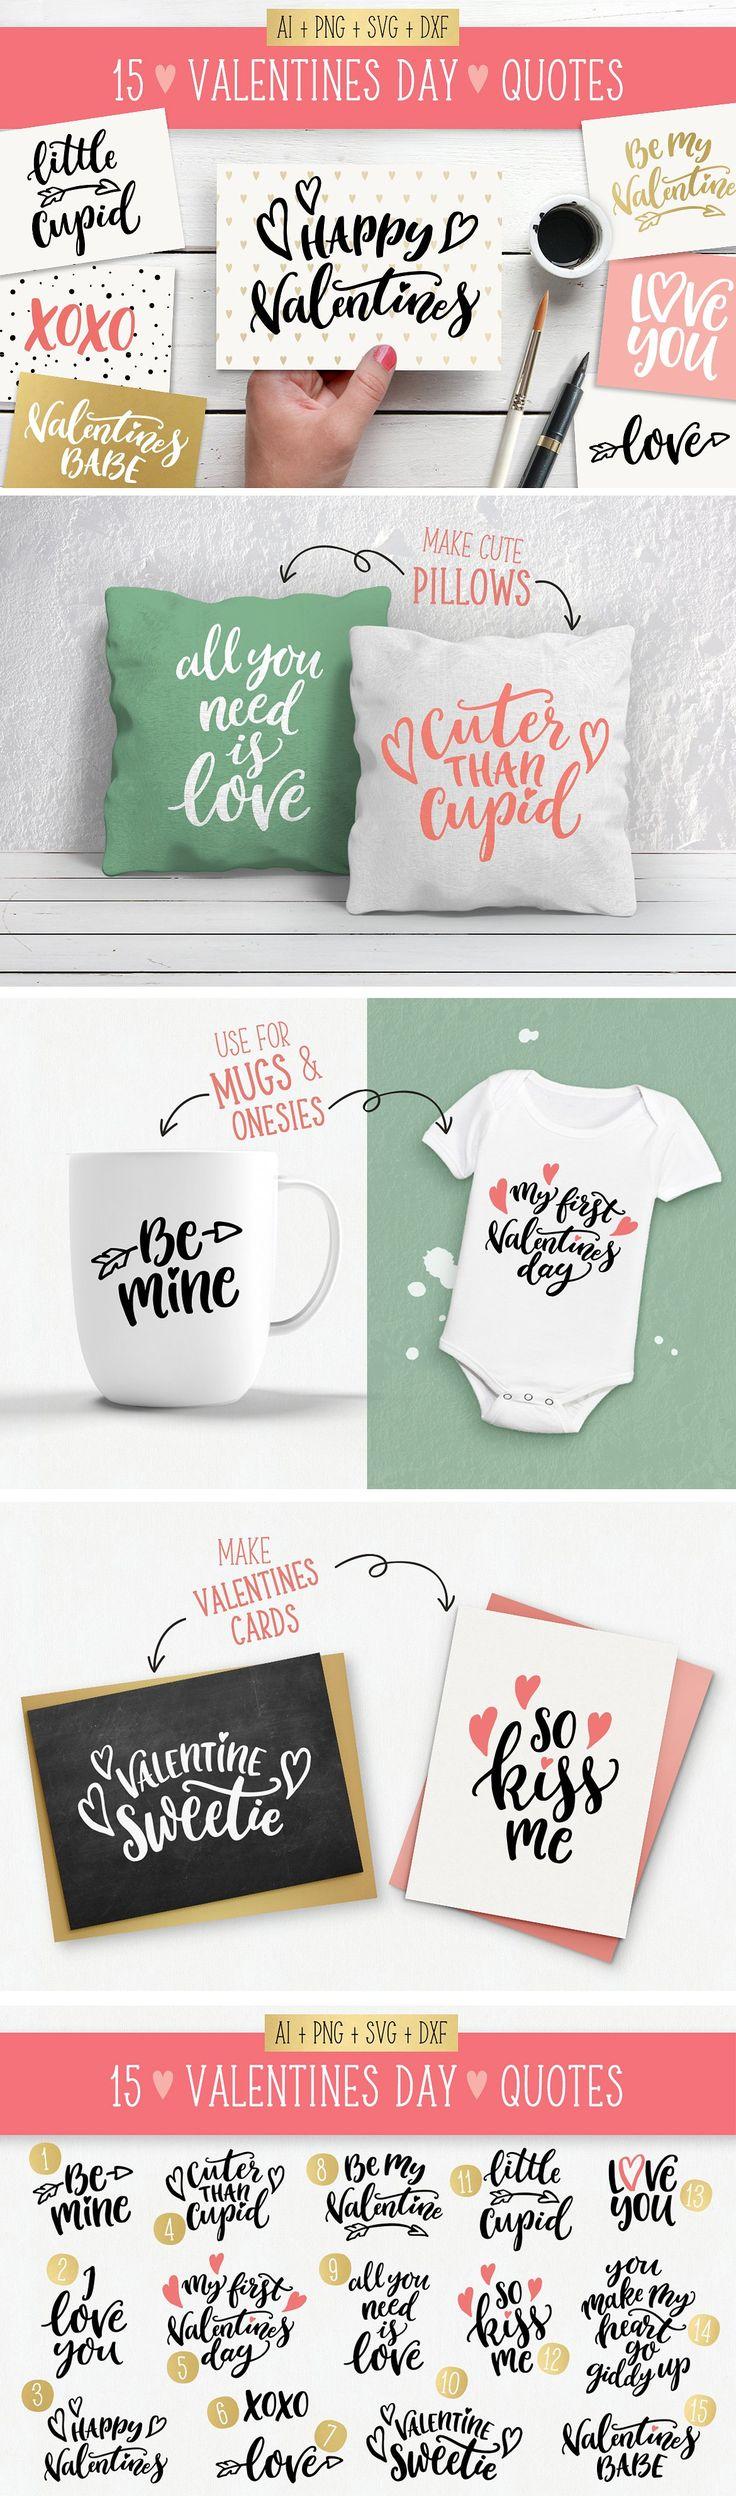 Valentines Day quotes SVG bundle by Skyla Design on @creativemarket